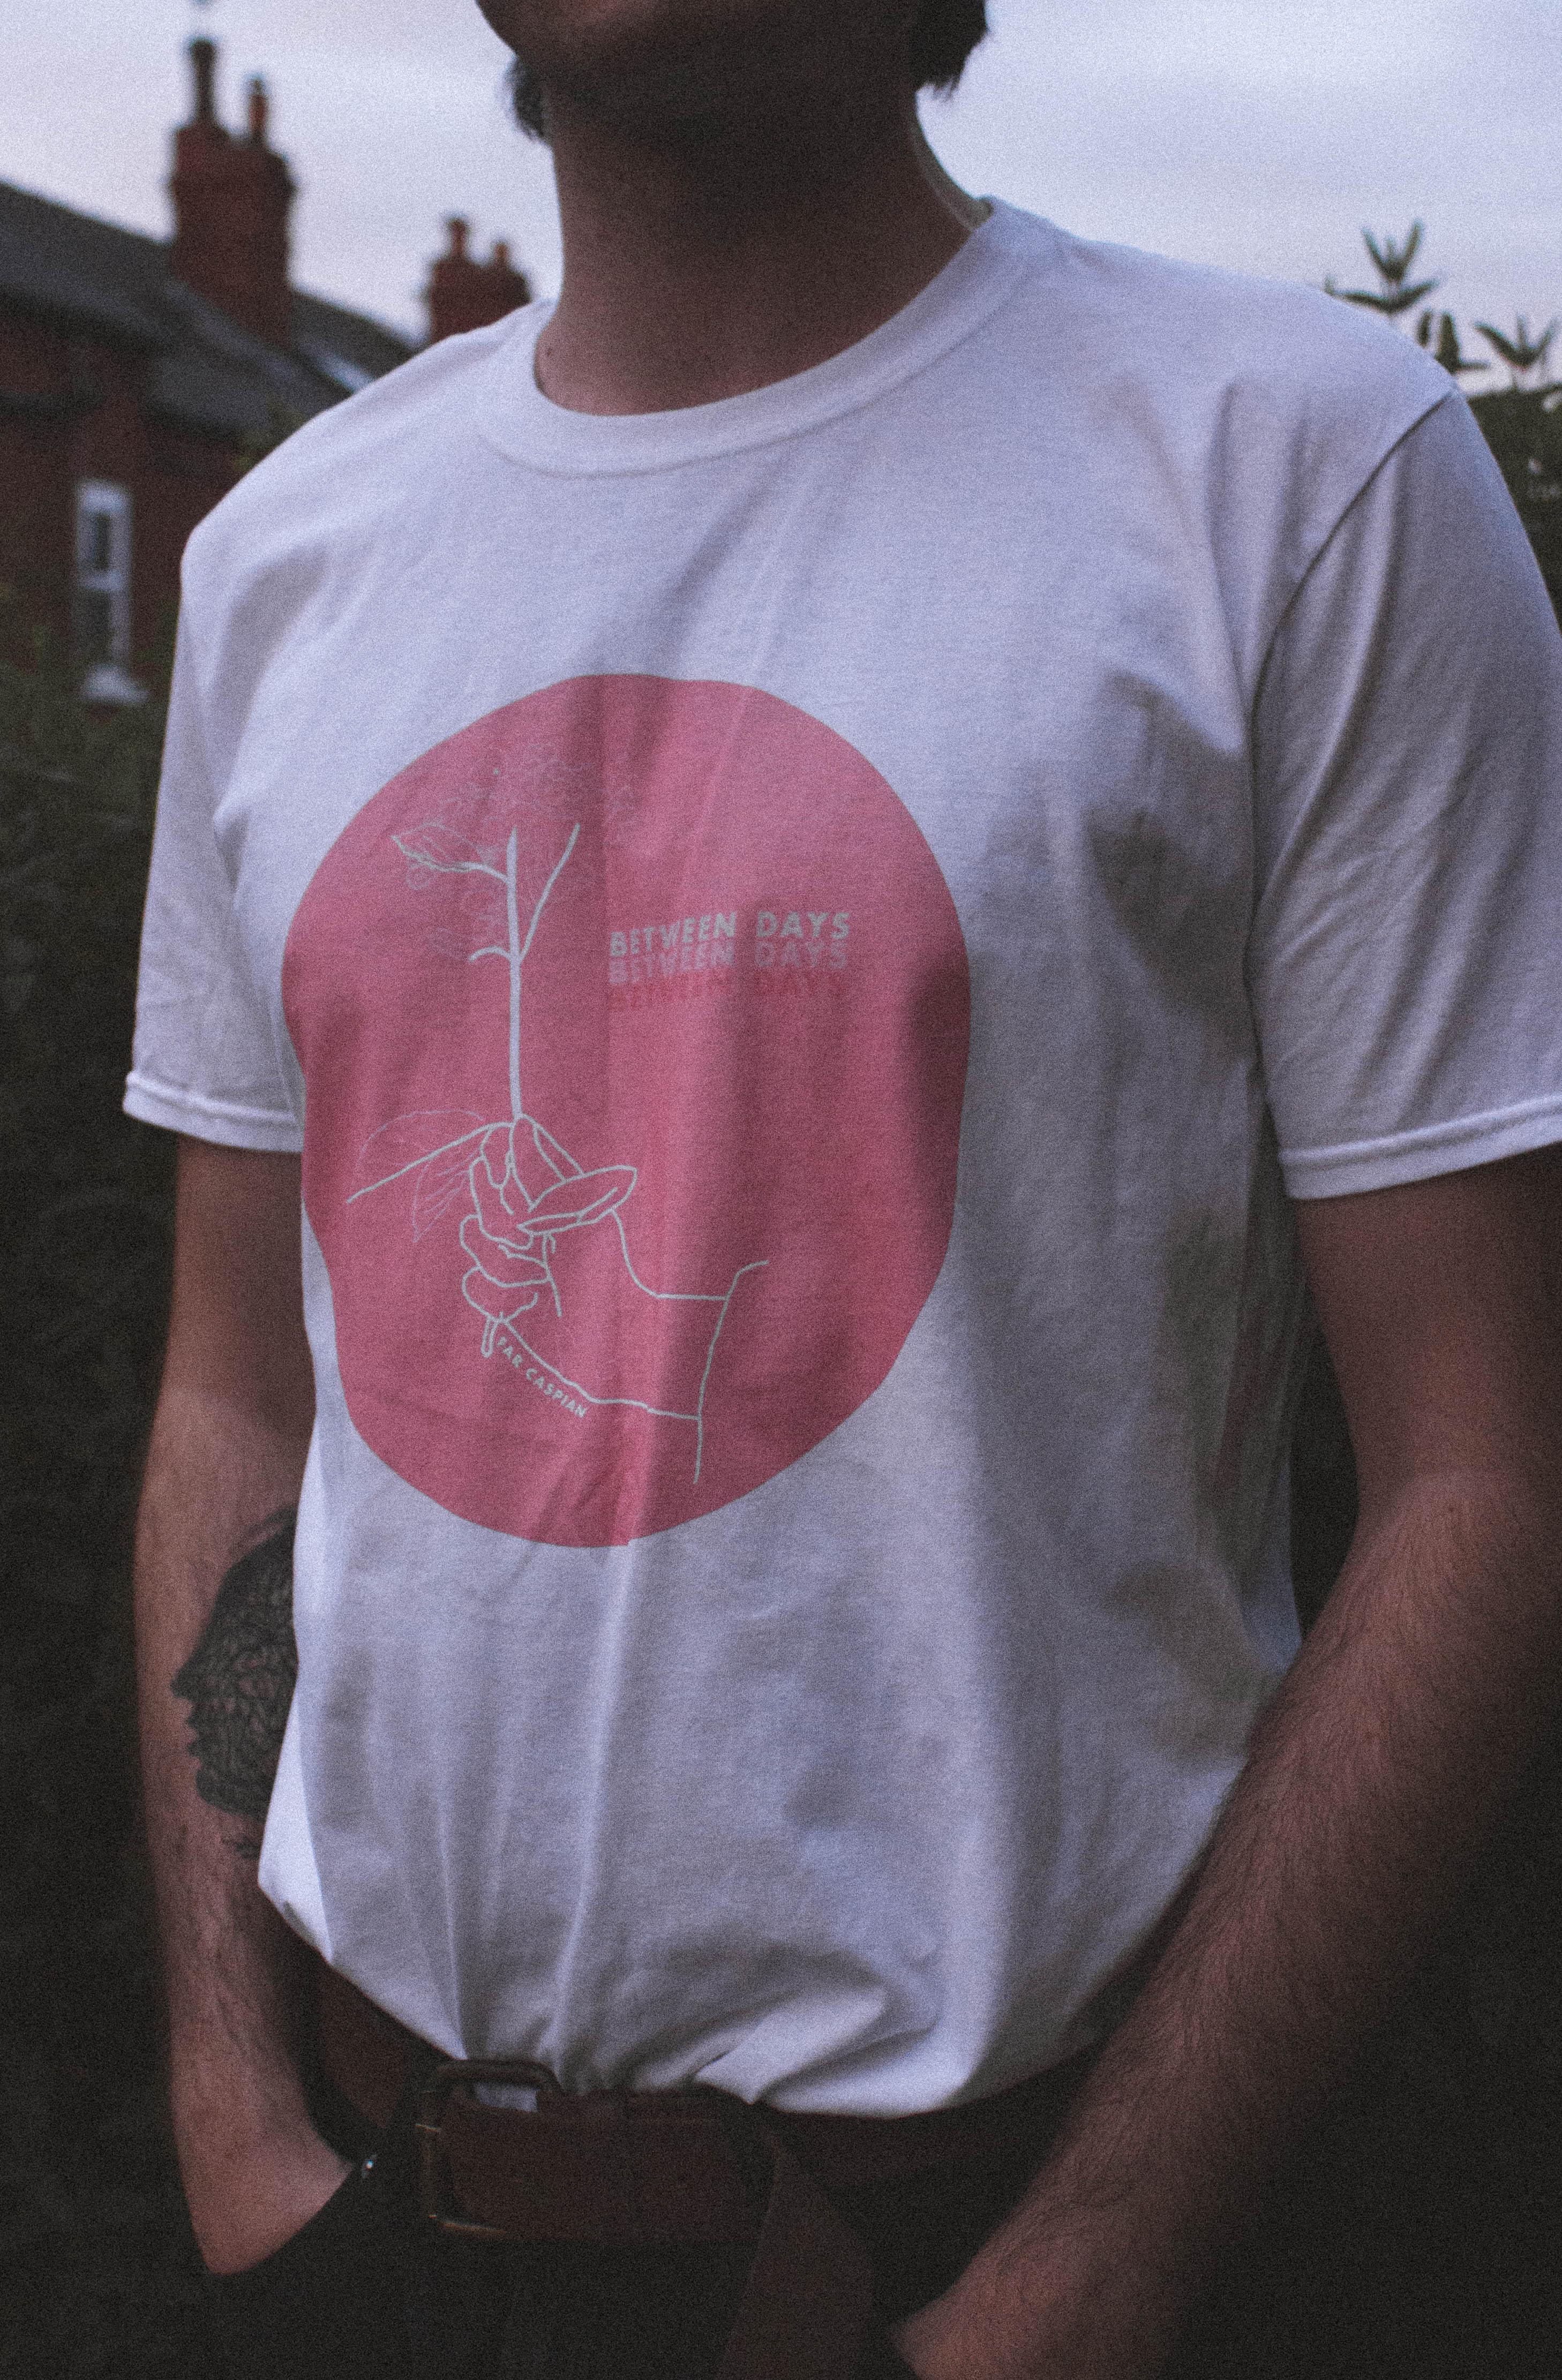 White T-Shirt - Between Days